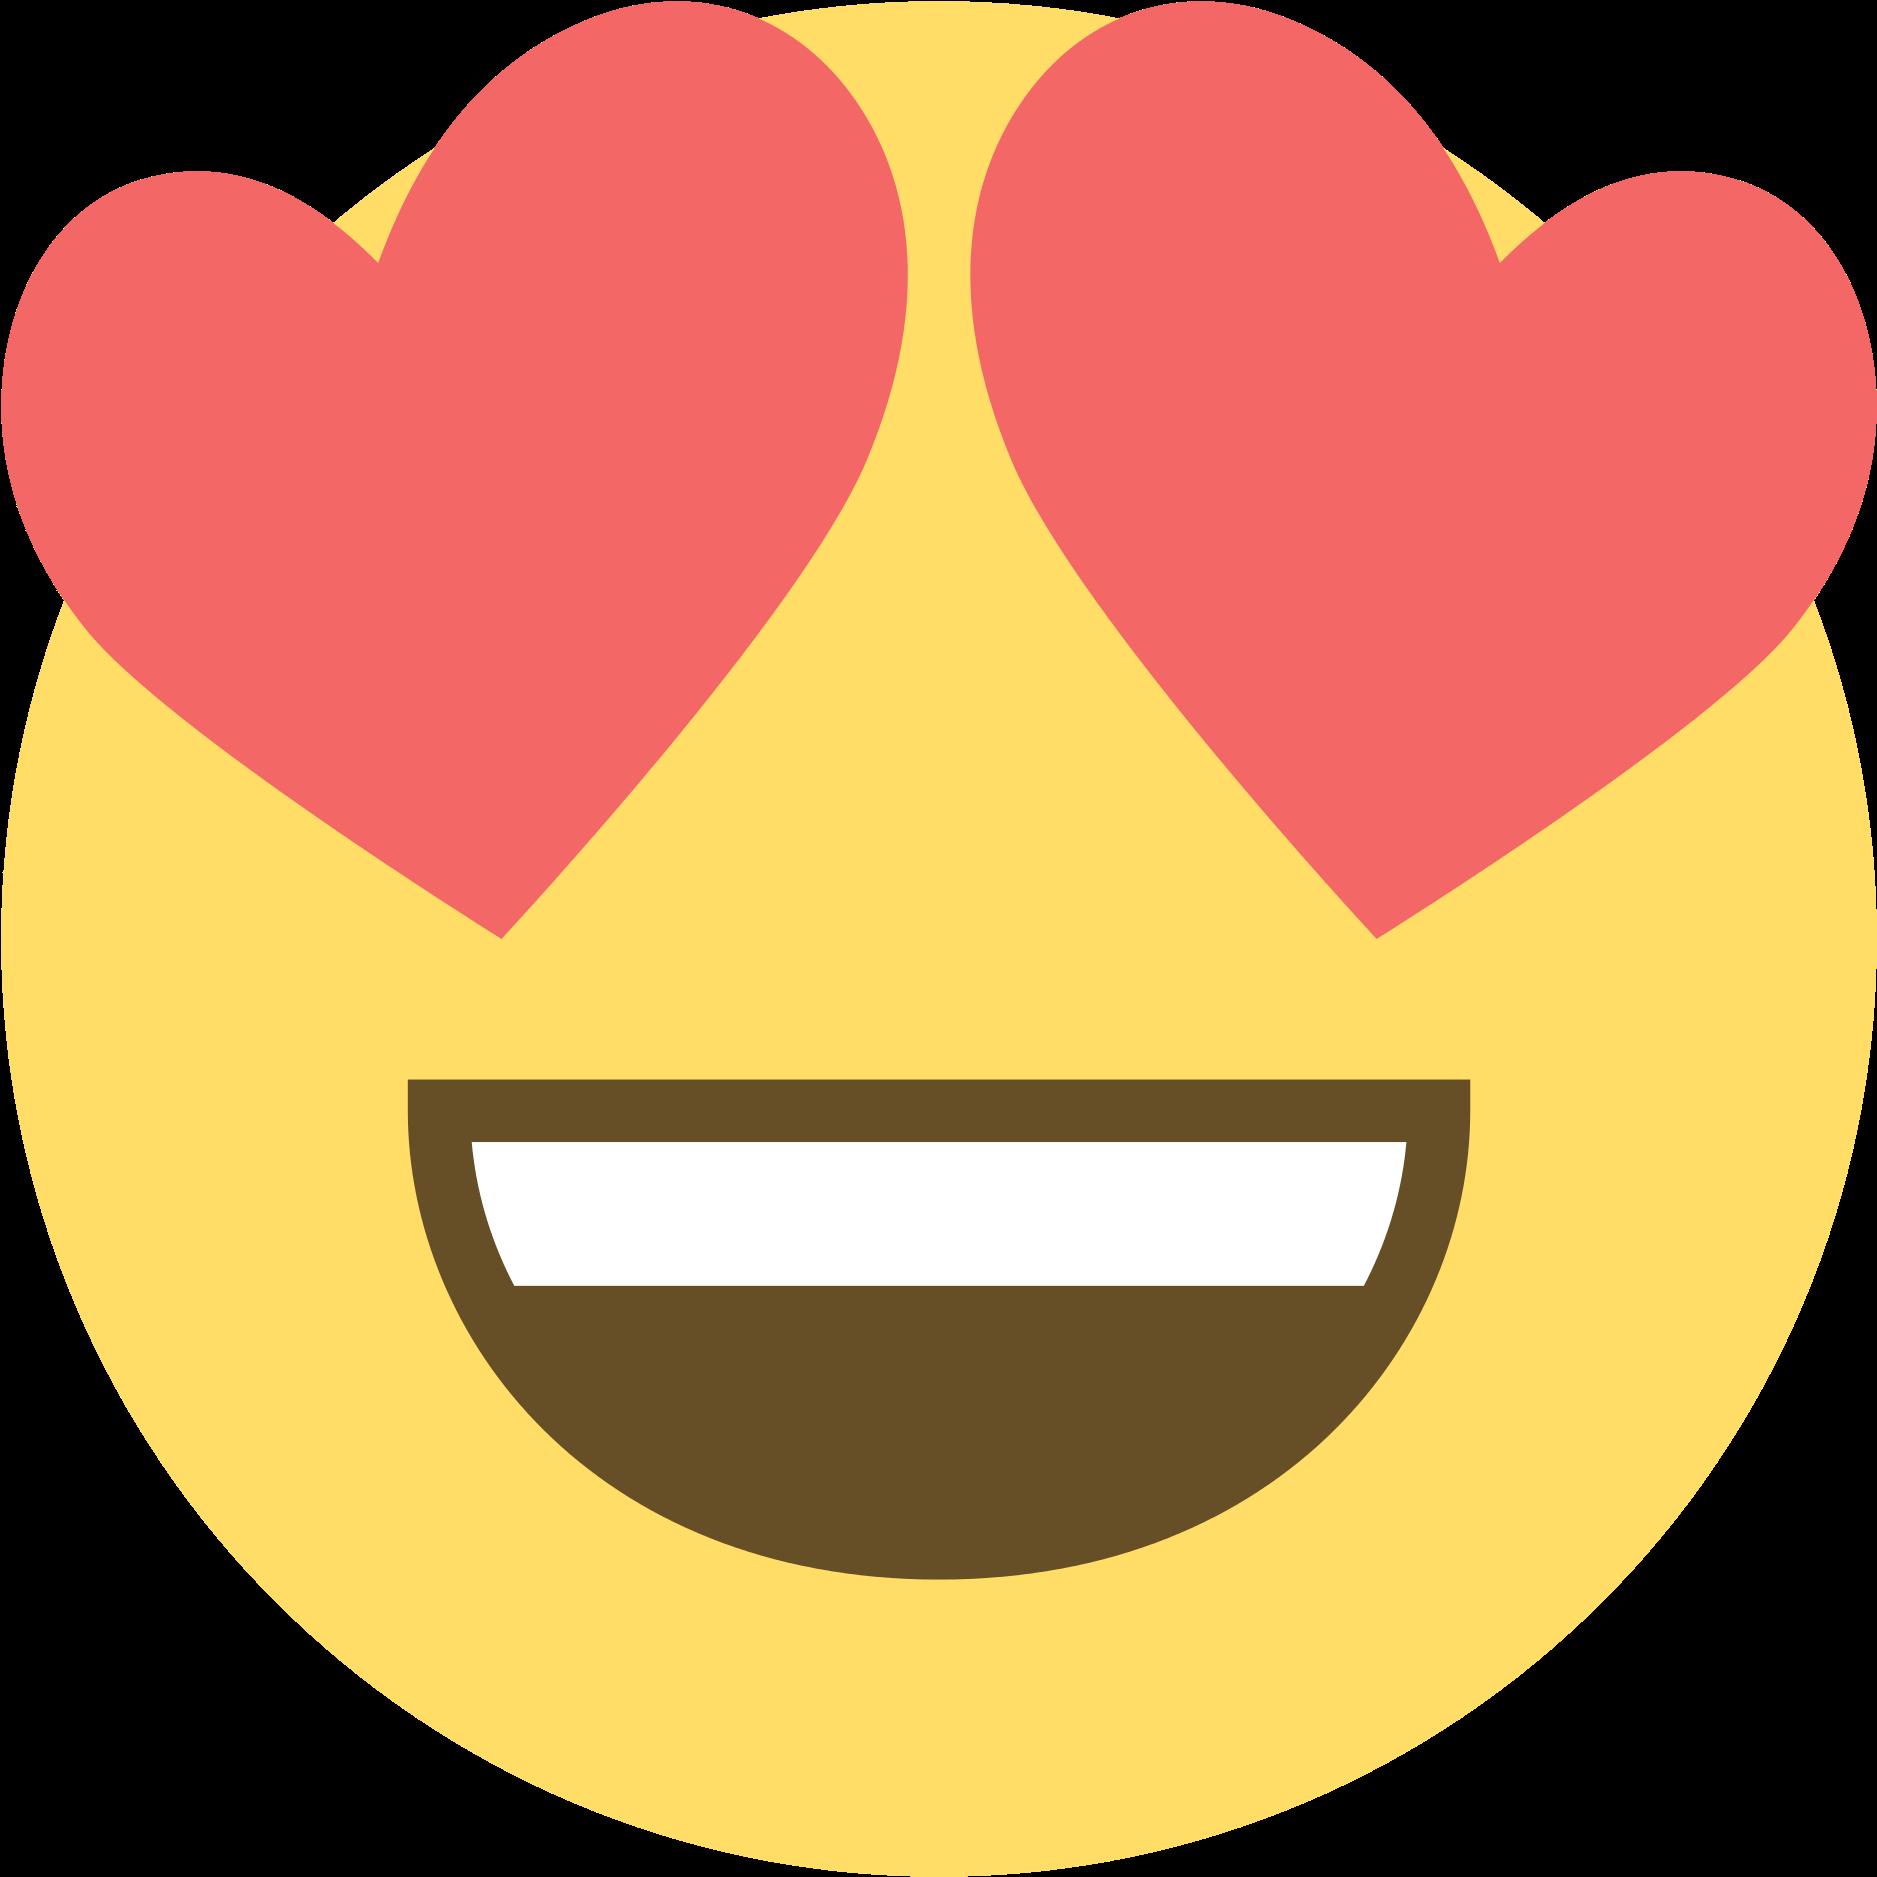 Whatsapp Emoji Download Png Emoji Png Download Transparent